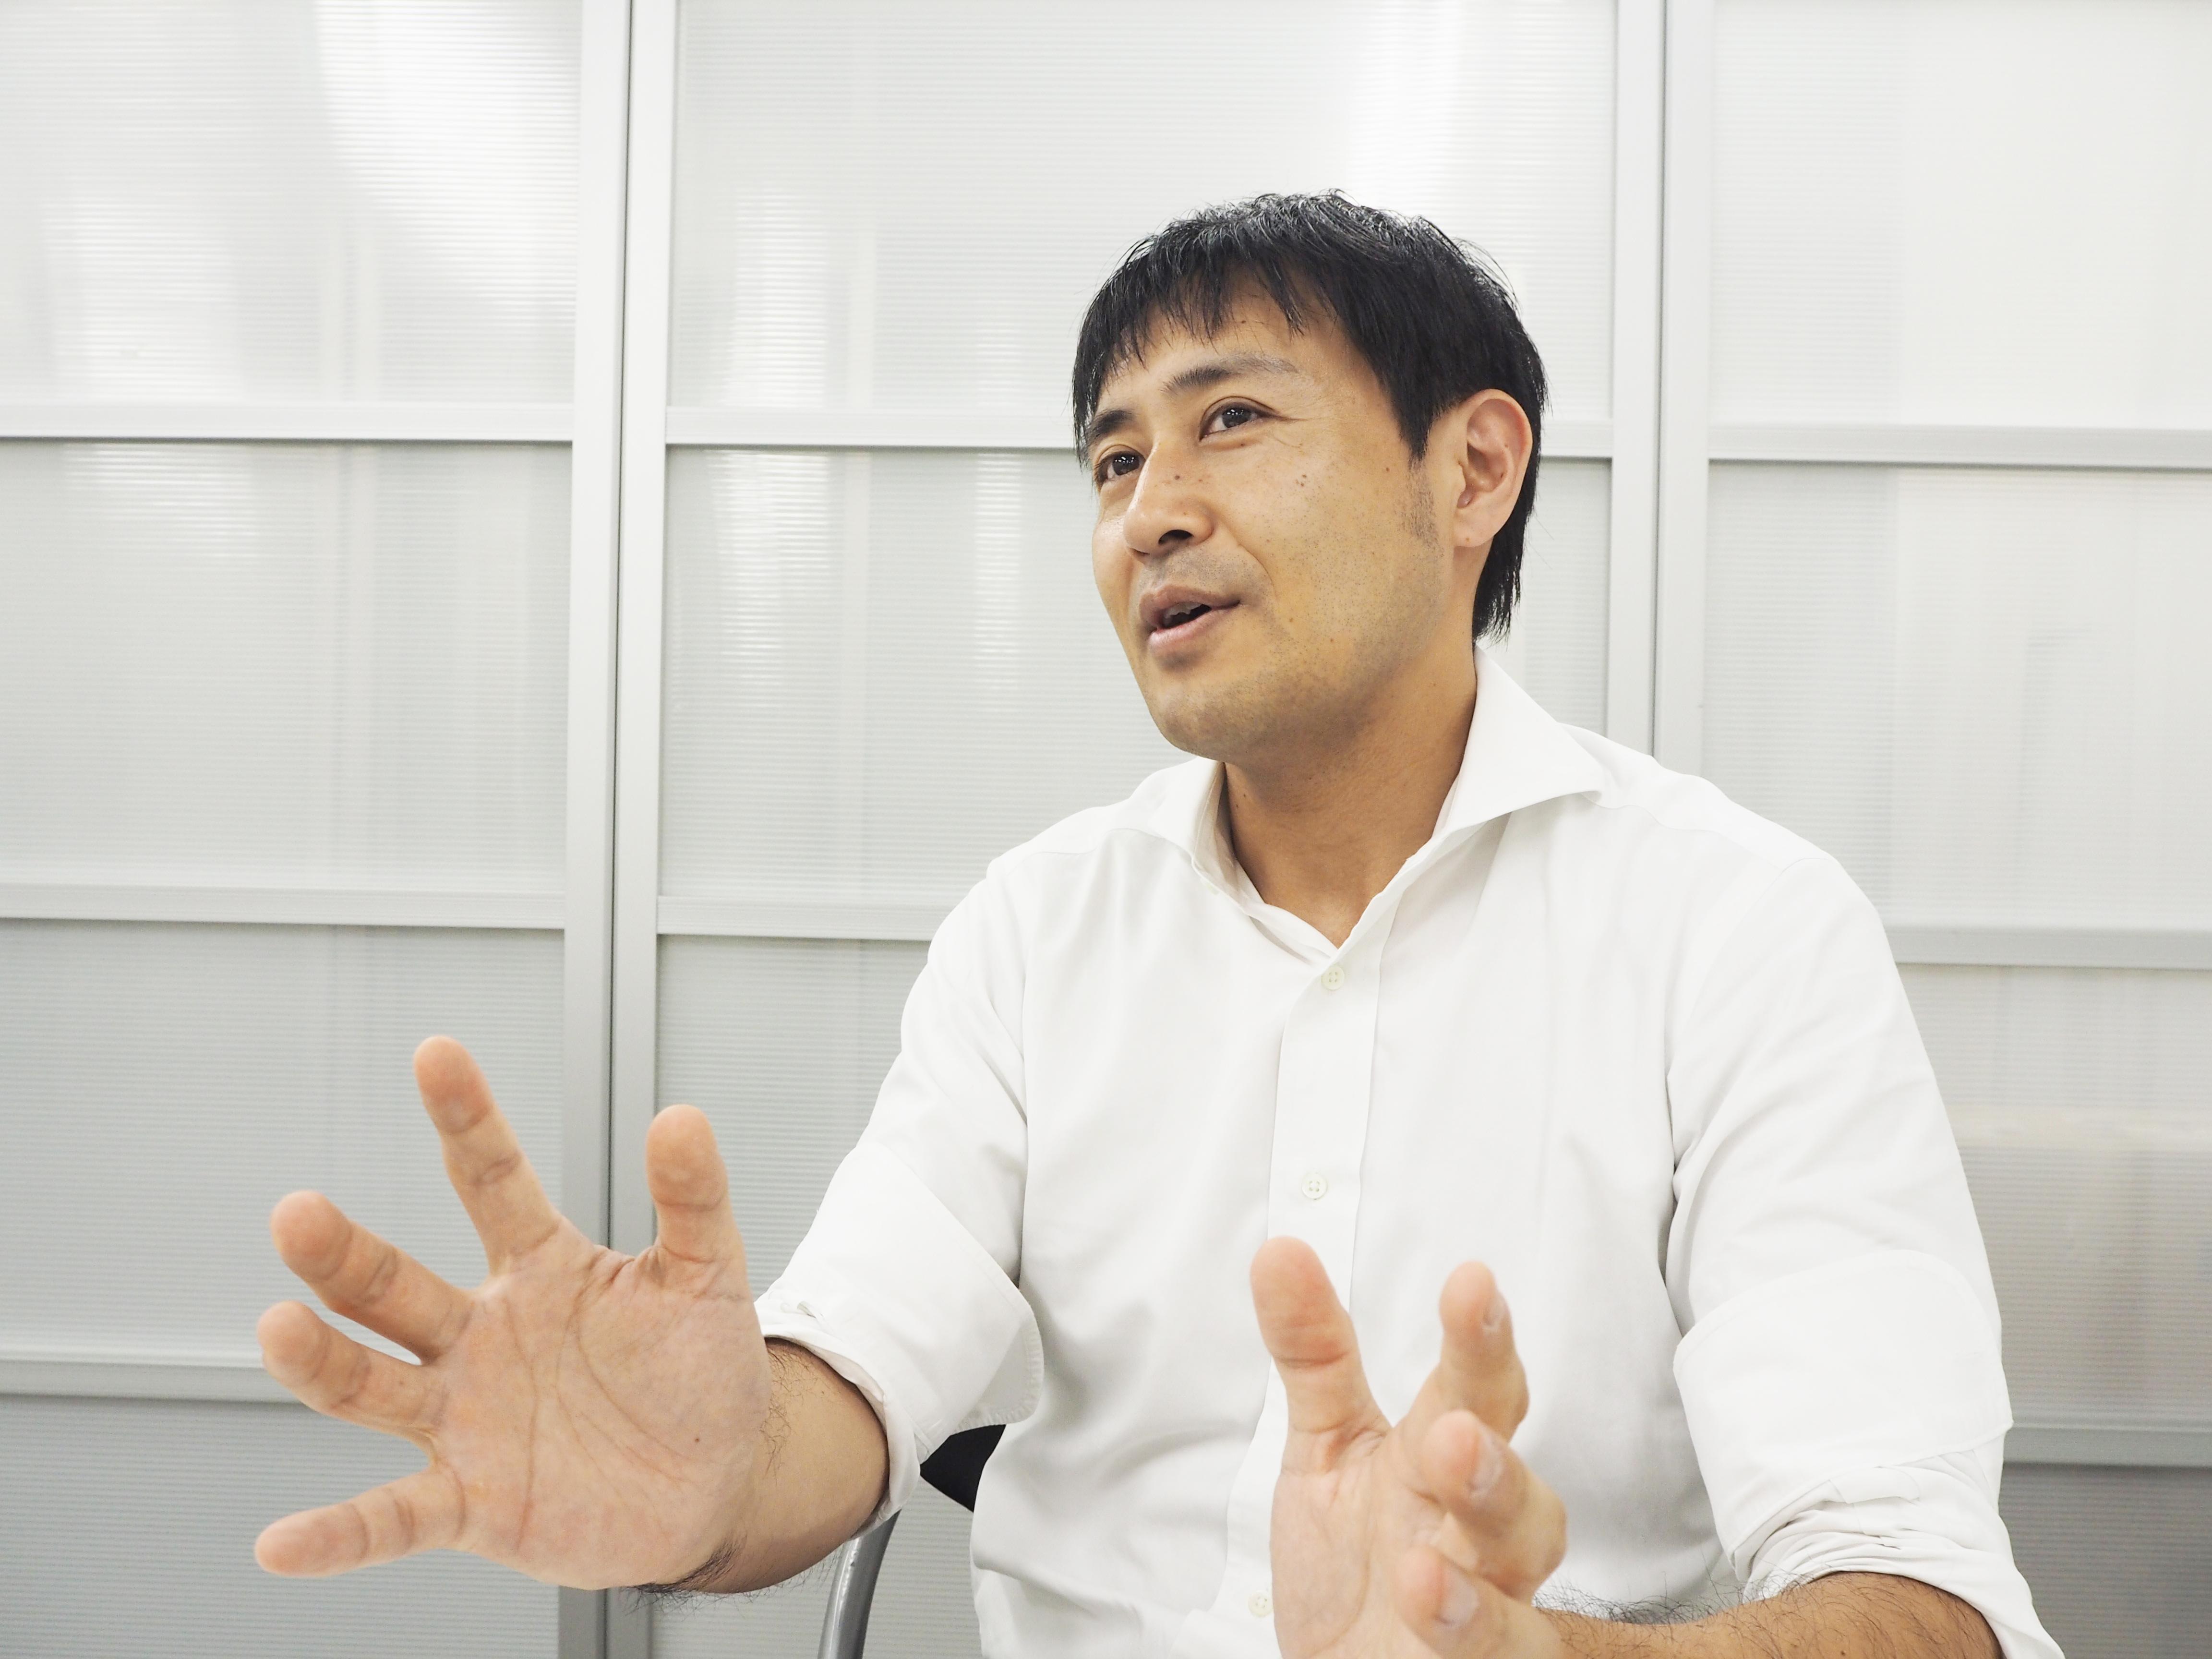 整体ショーツ開発者 小林篤史氏